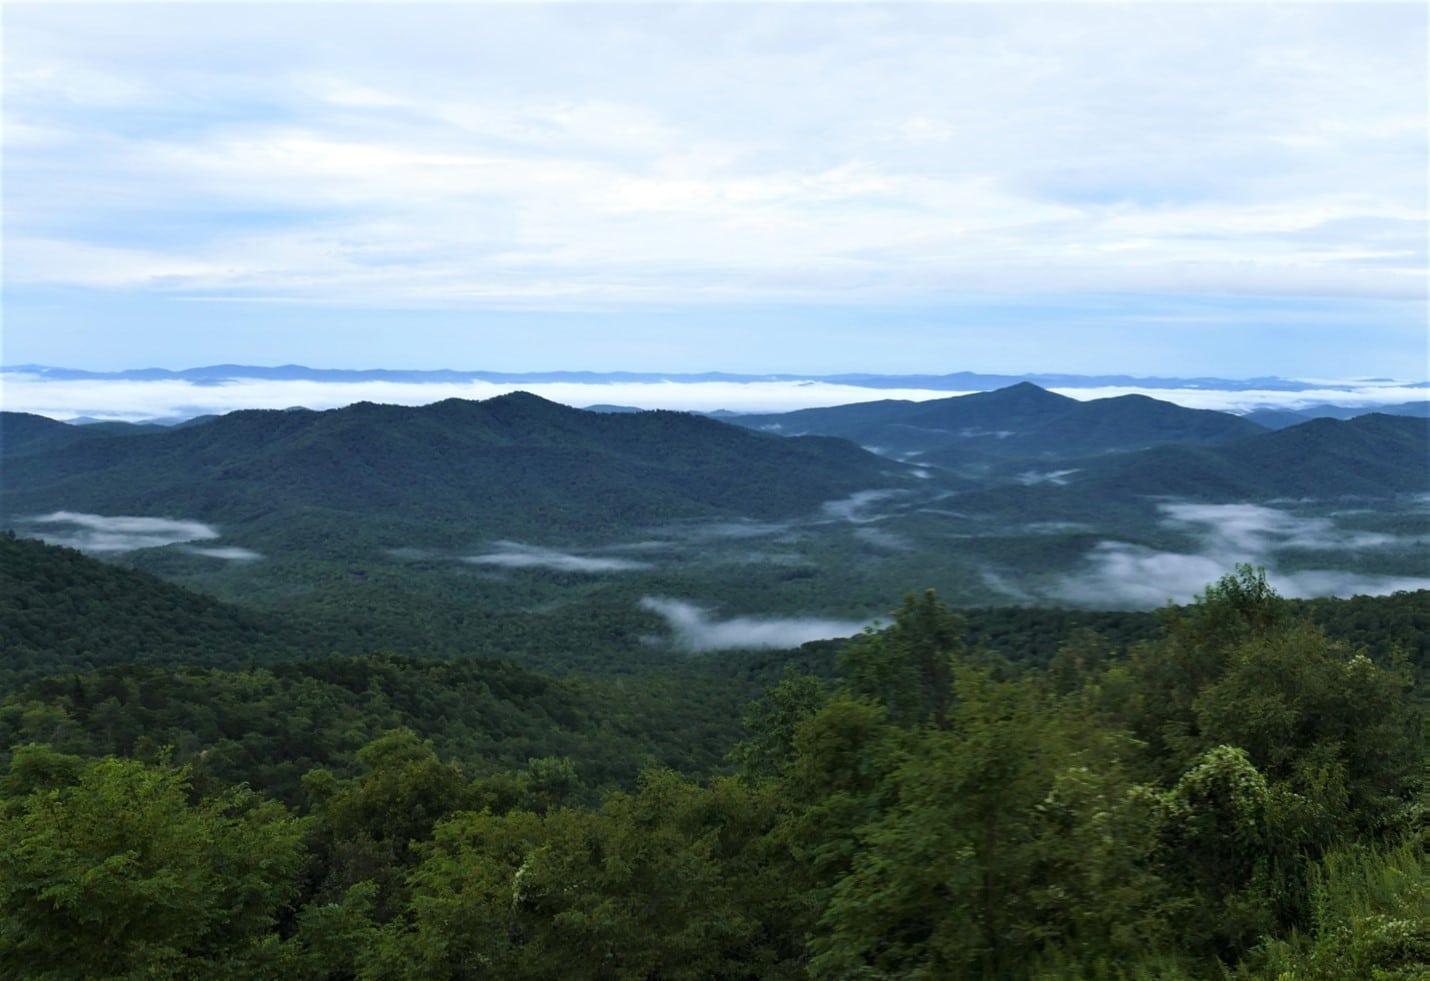 View of misty Blue Ridge Mountains from Pisgah Inn terrace